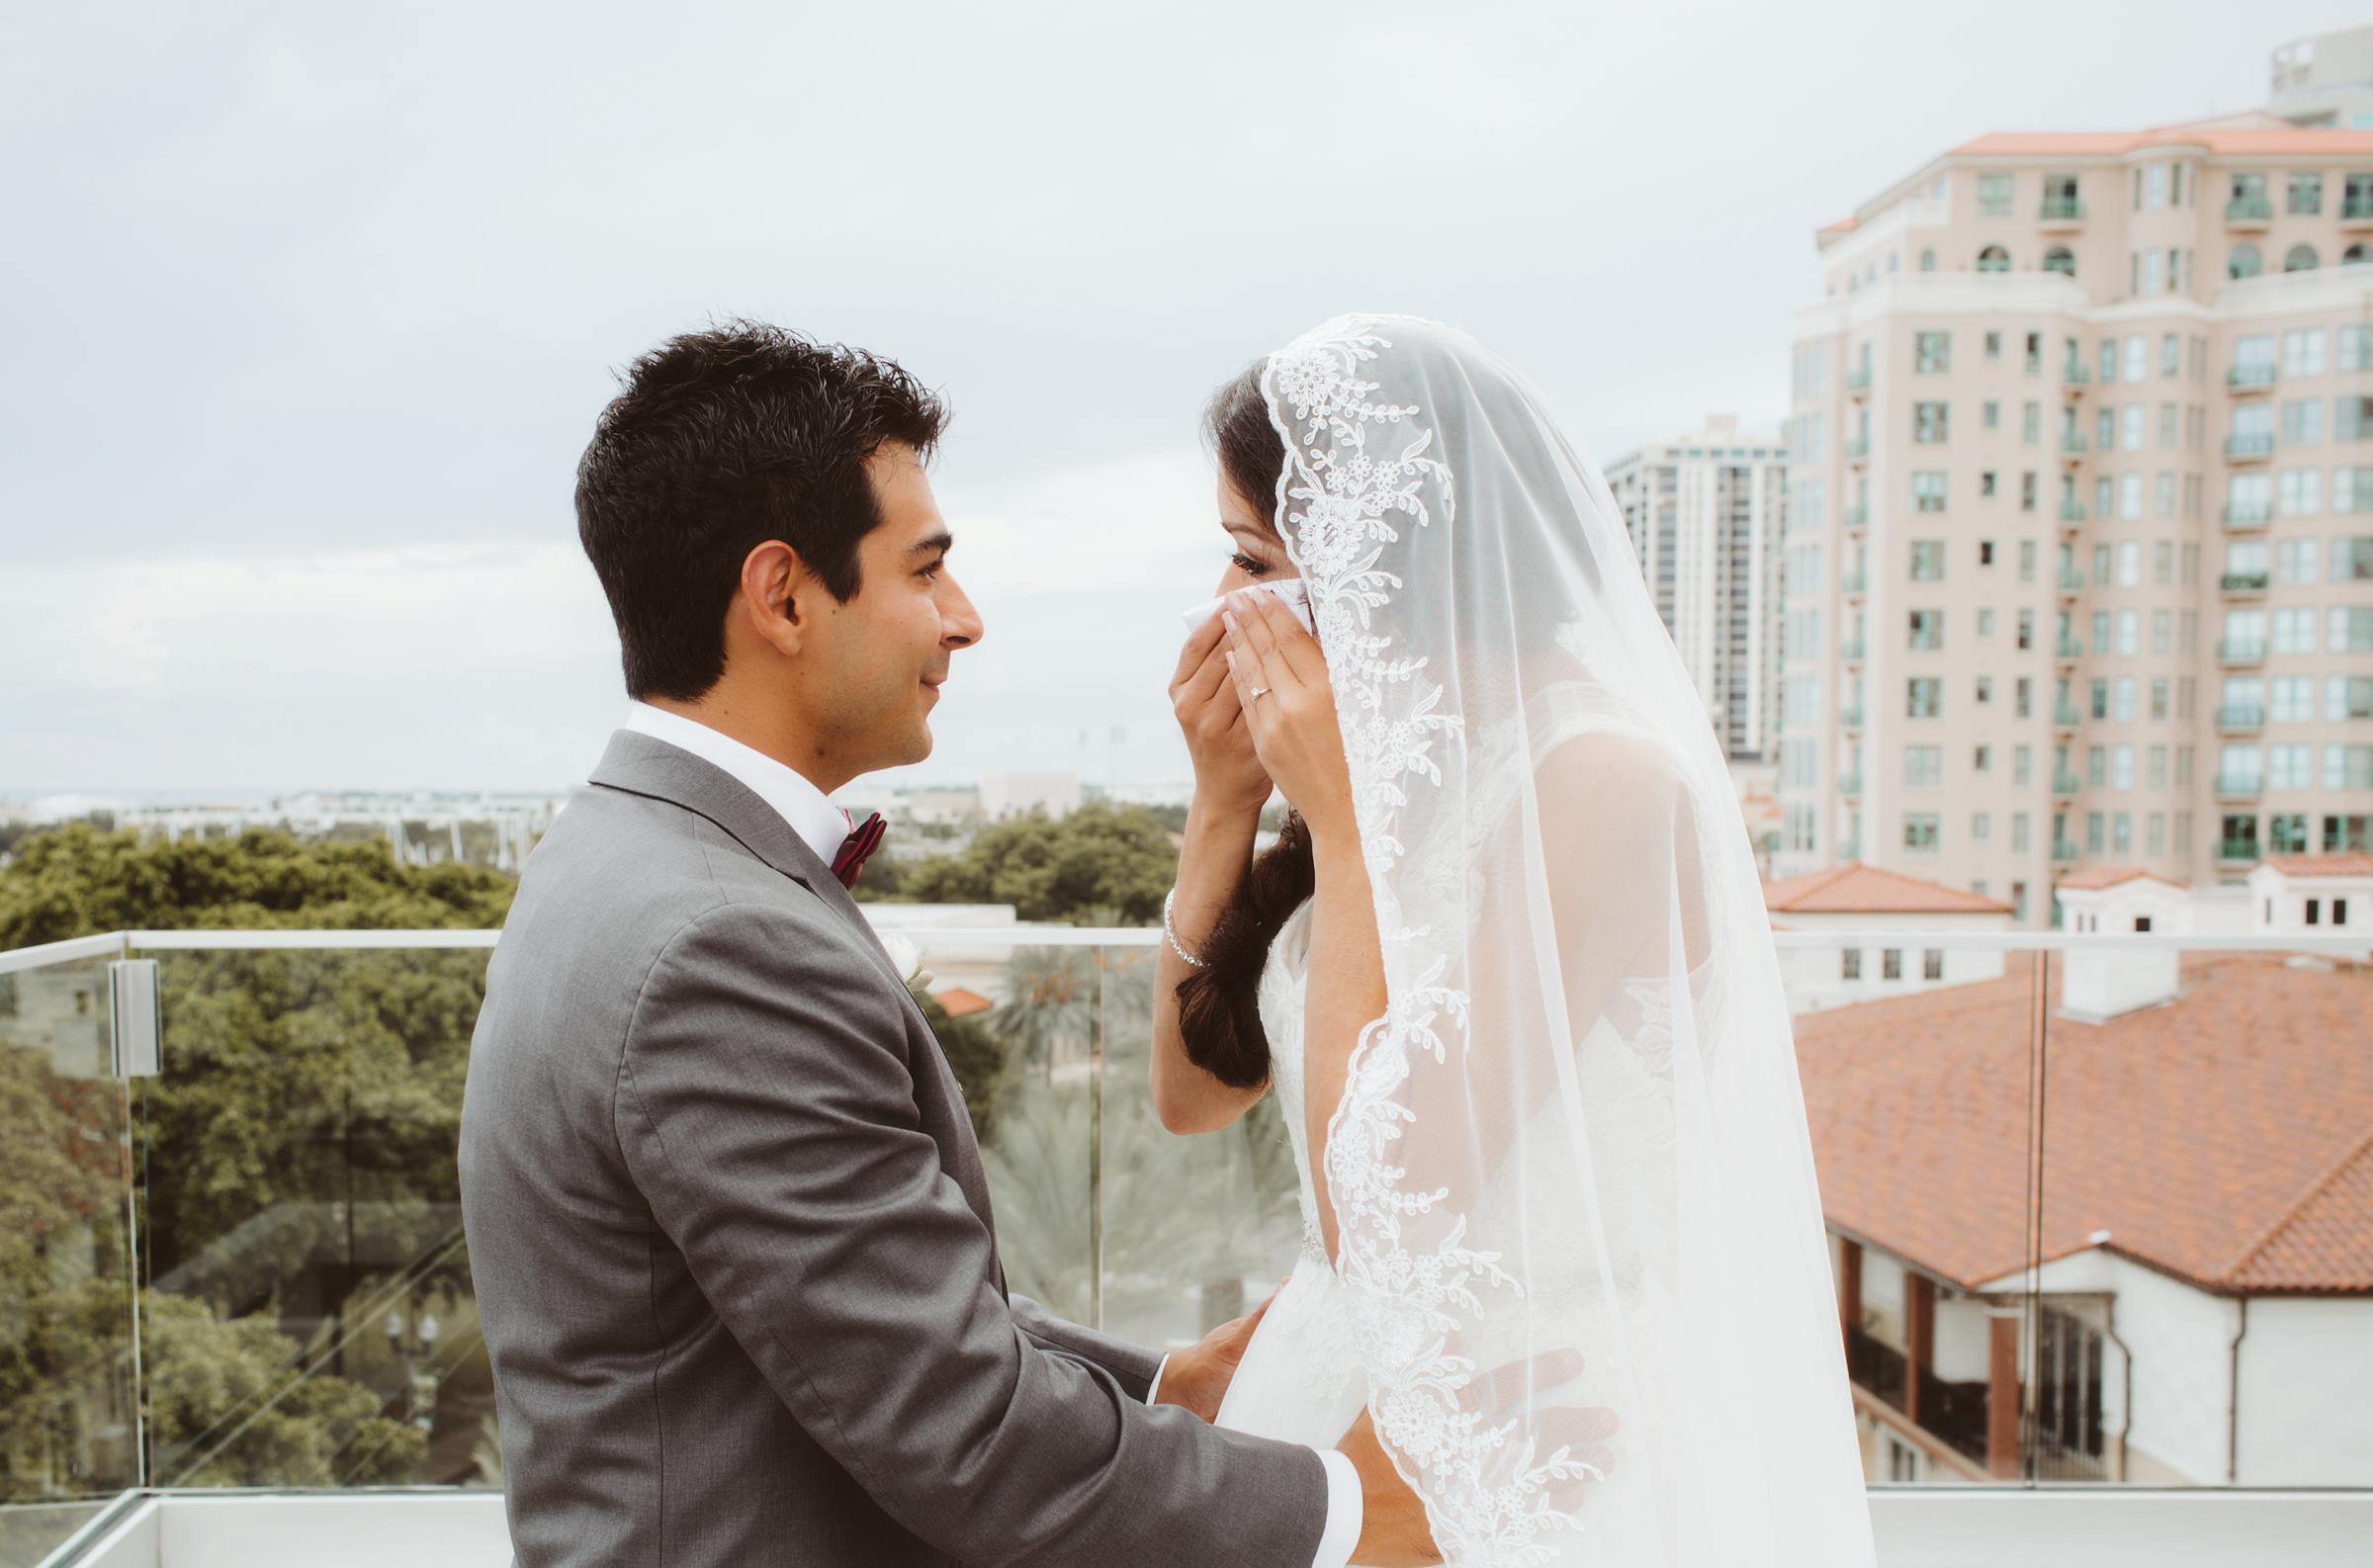 wedding day | MFA St Pete | Vanessa Boy Photography | vanessaboy.com-159.com |final.jpg